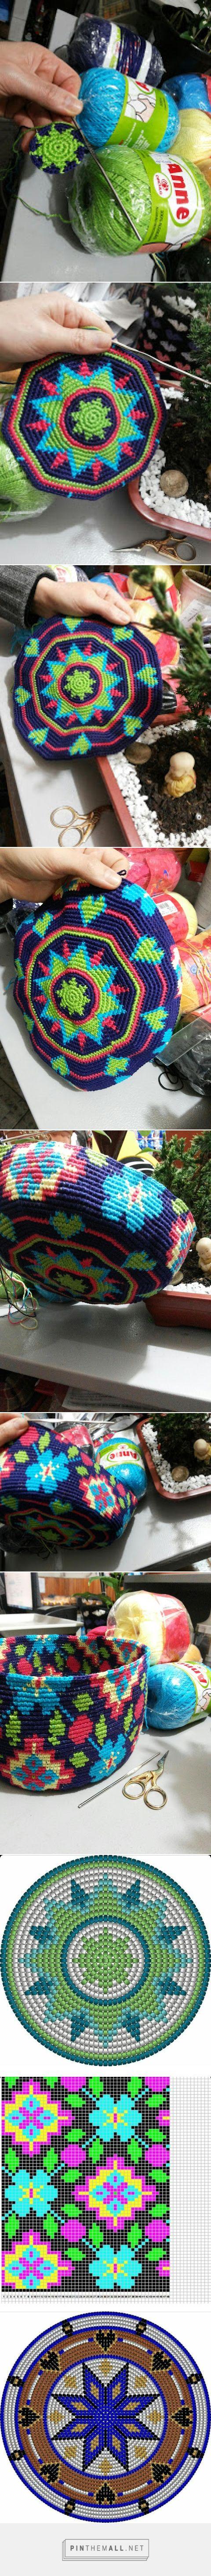 Crochet Wayuu Bags